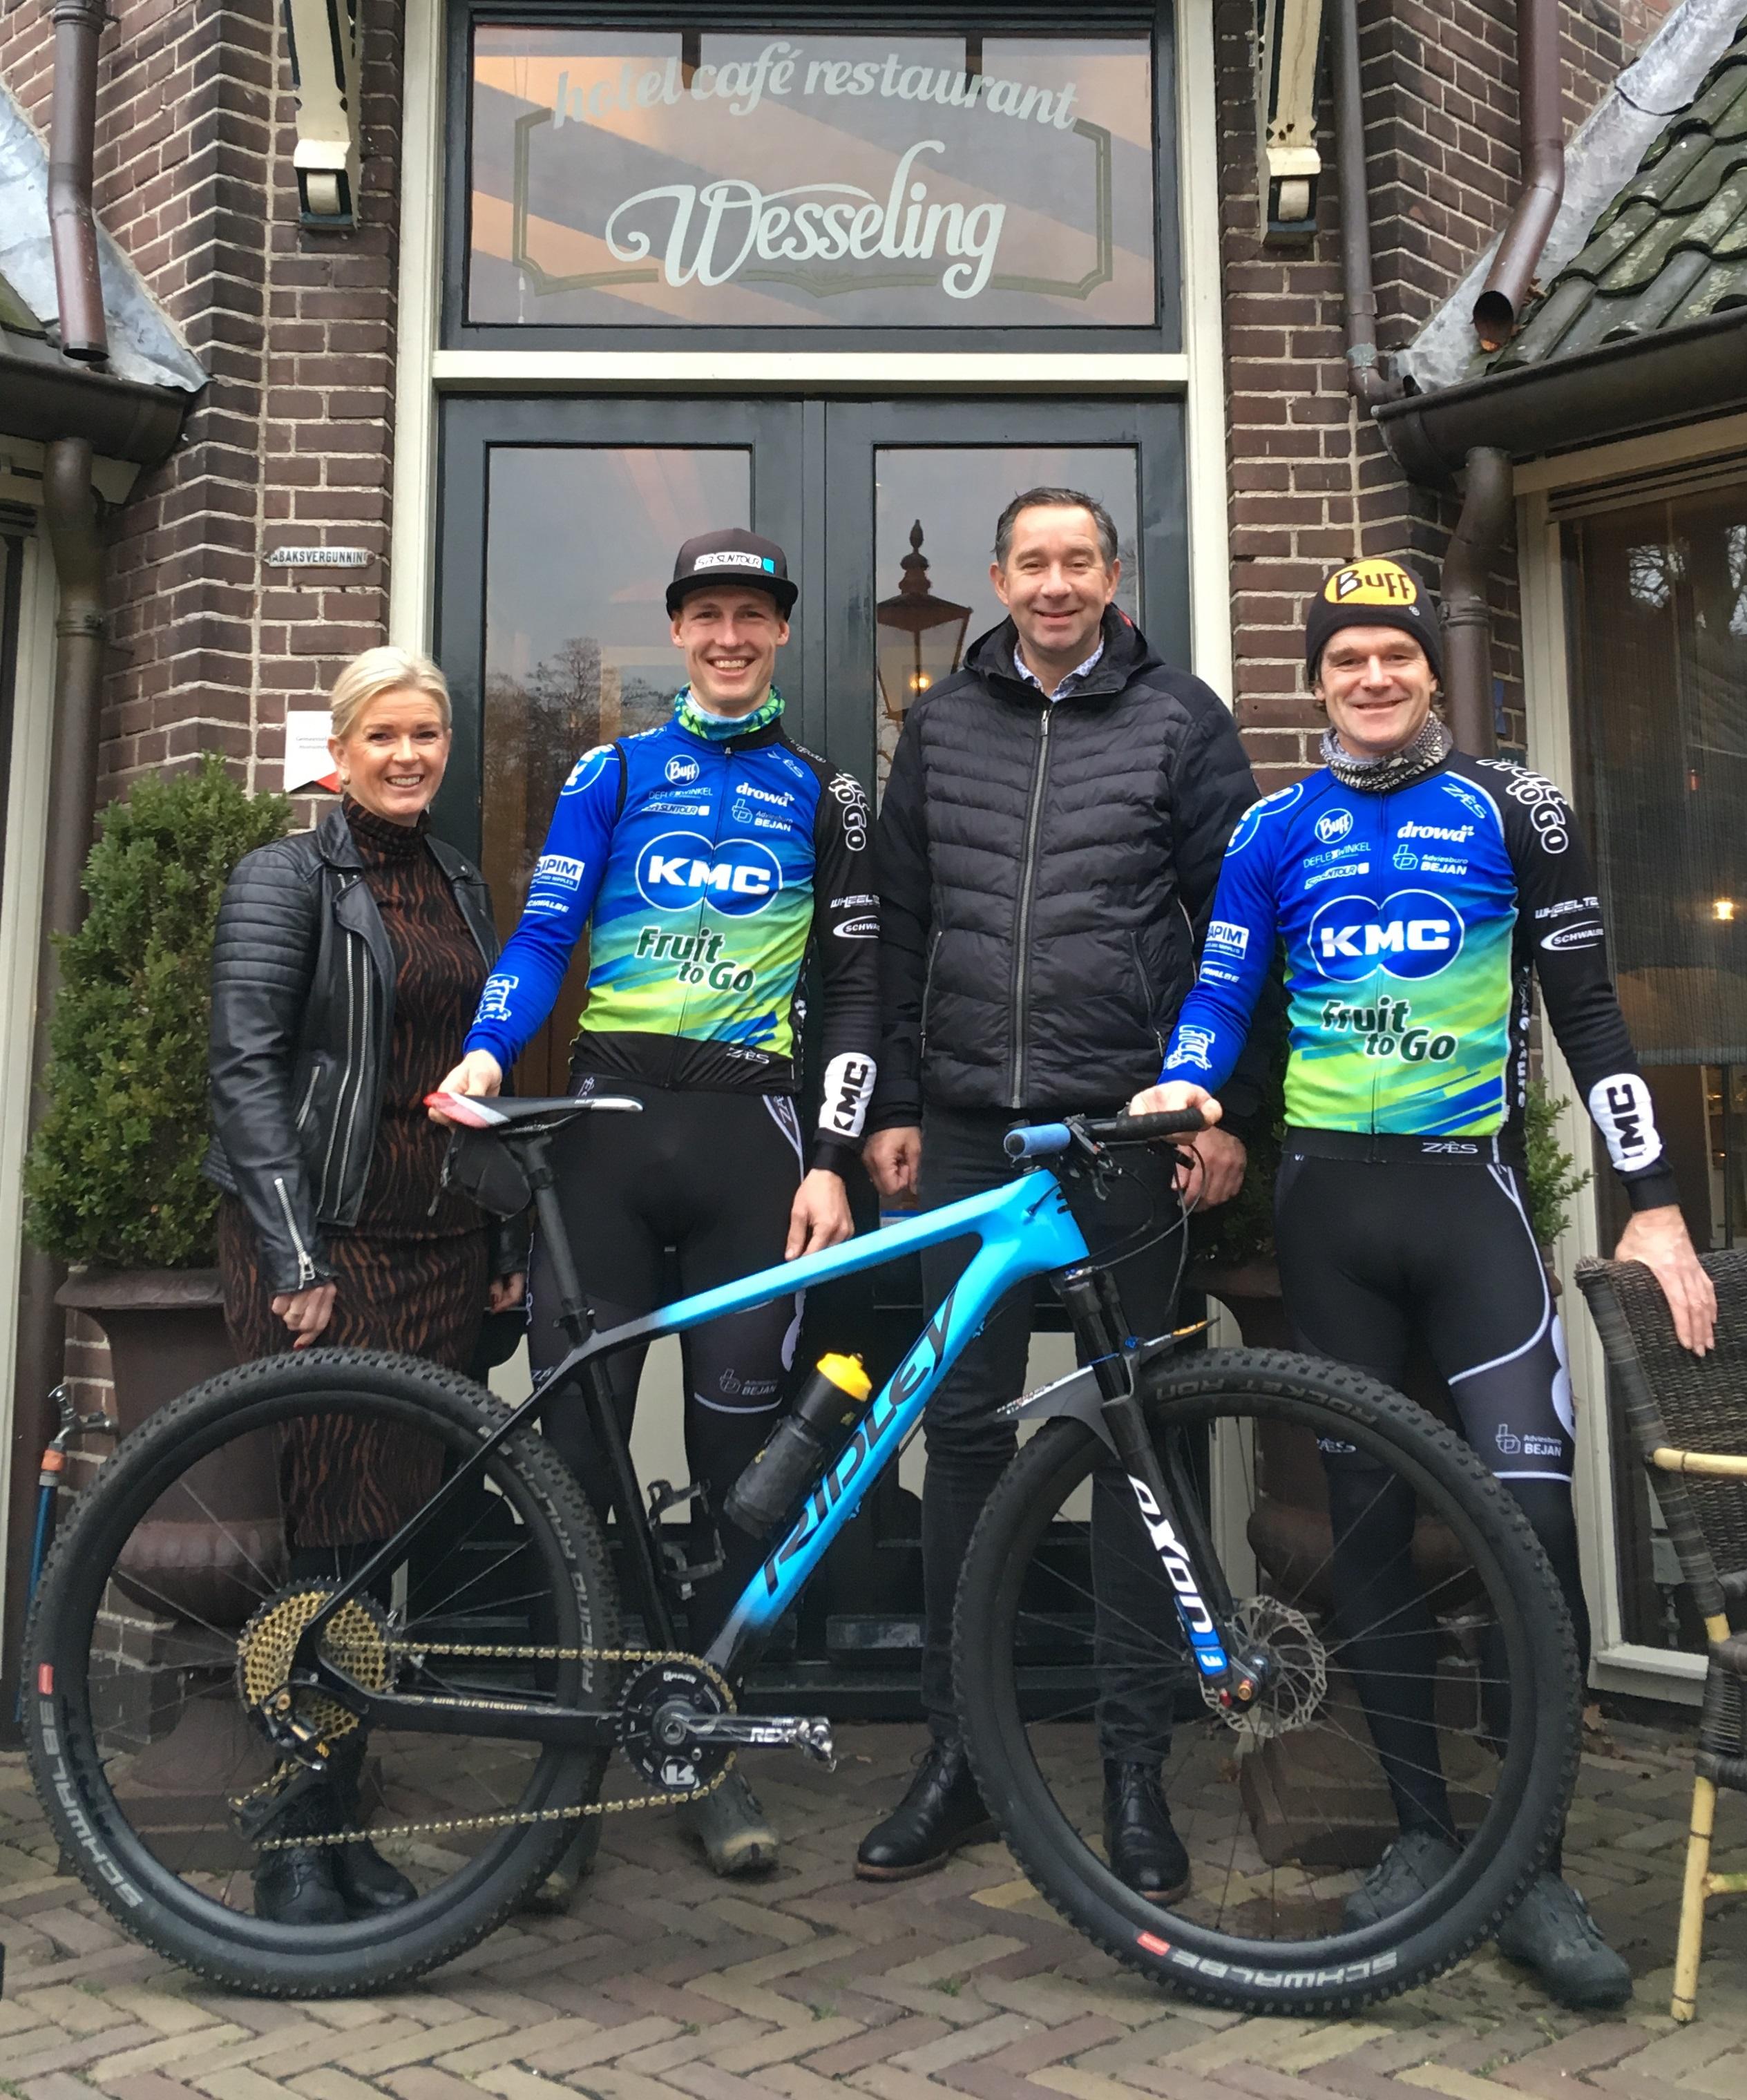 Hotel Wesseling partner KMC mountainbiketeam